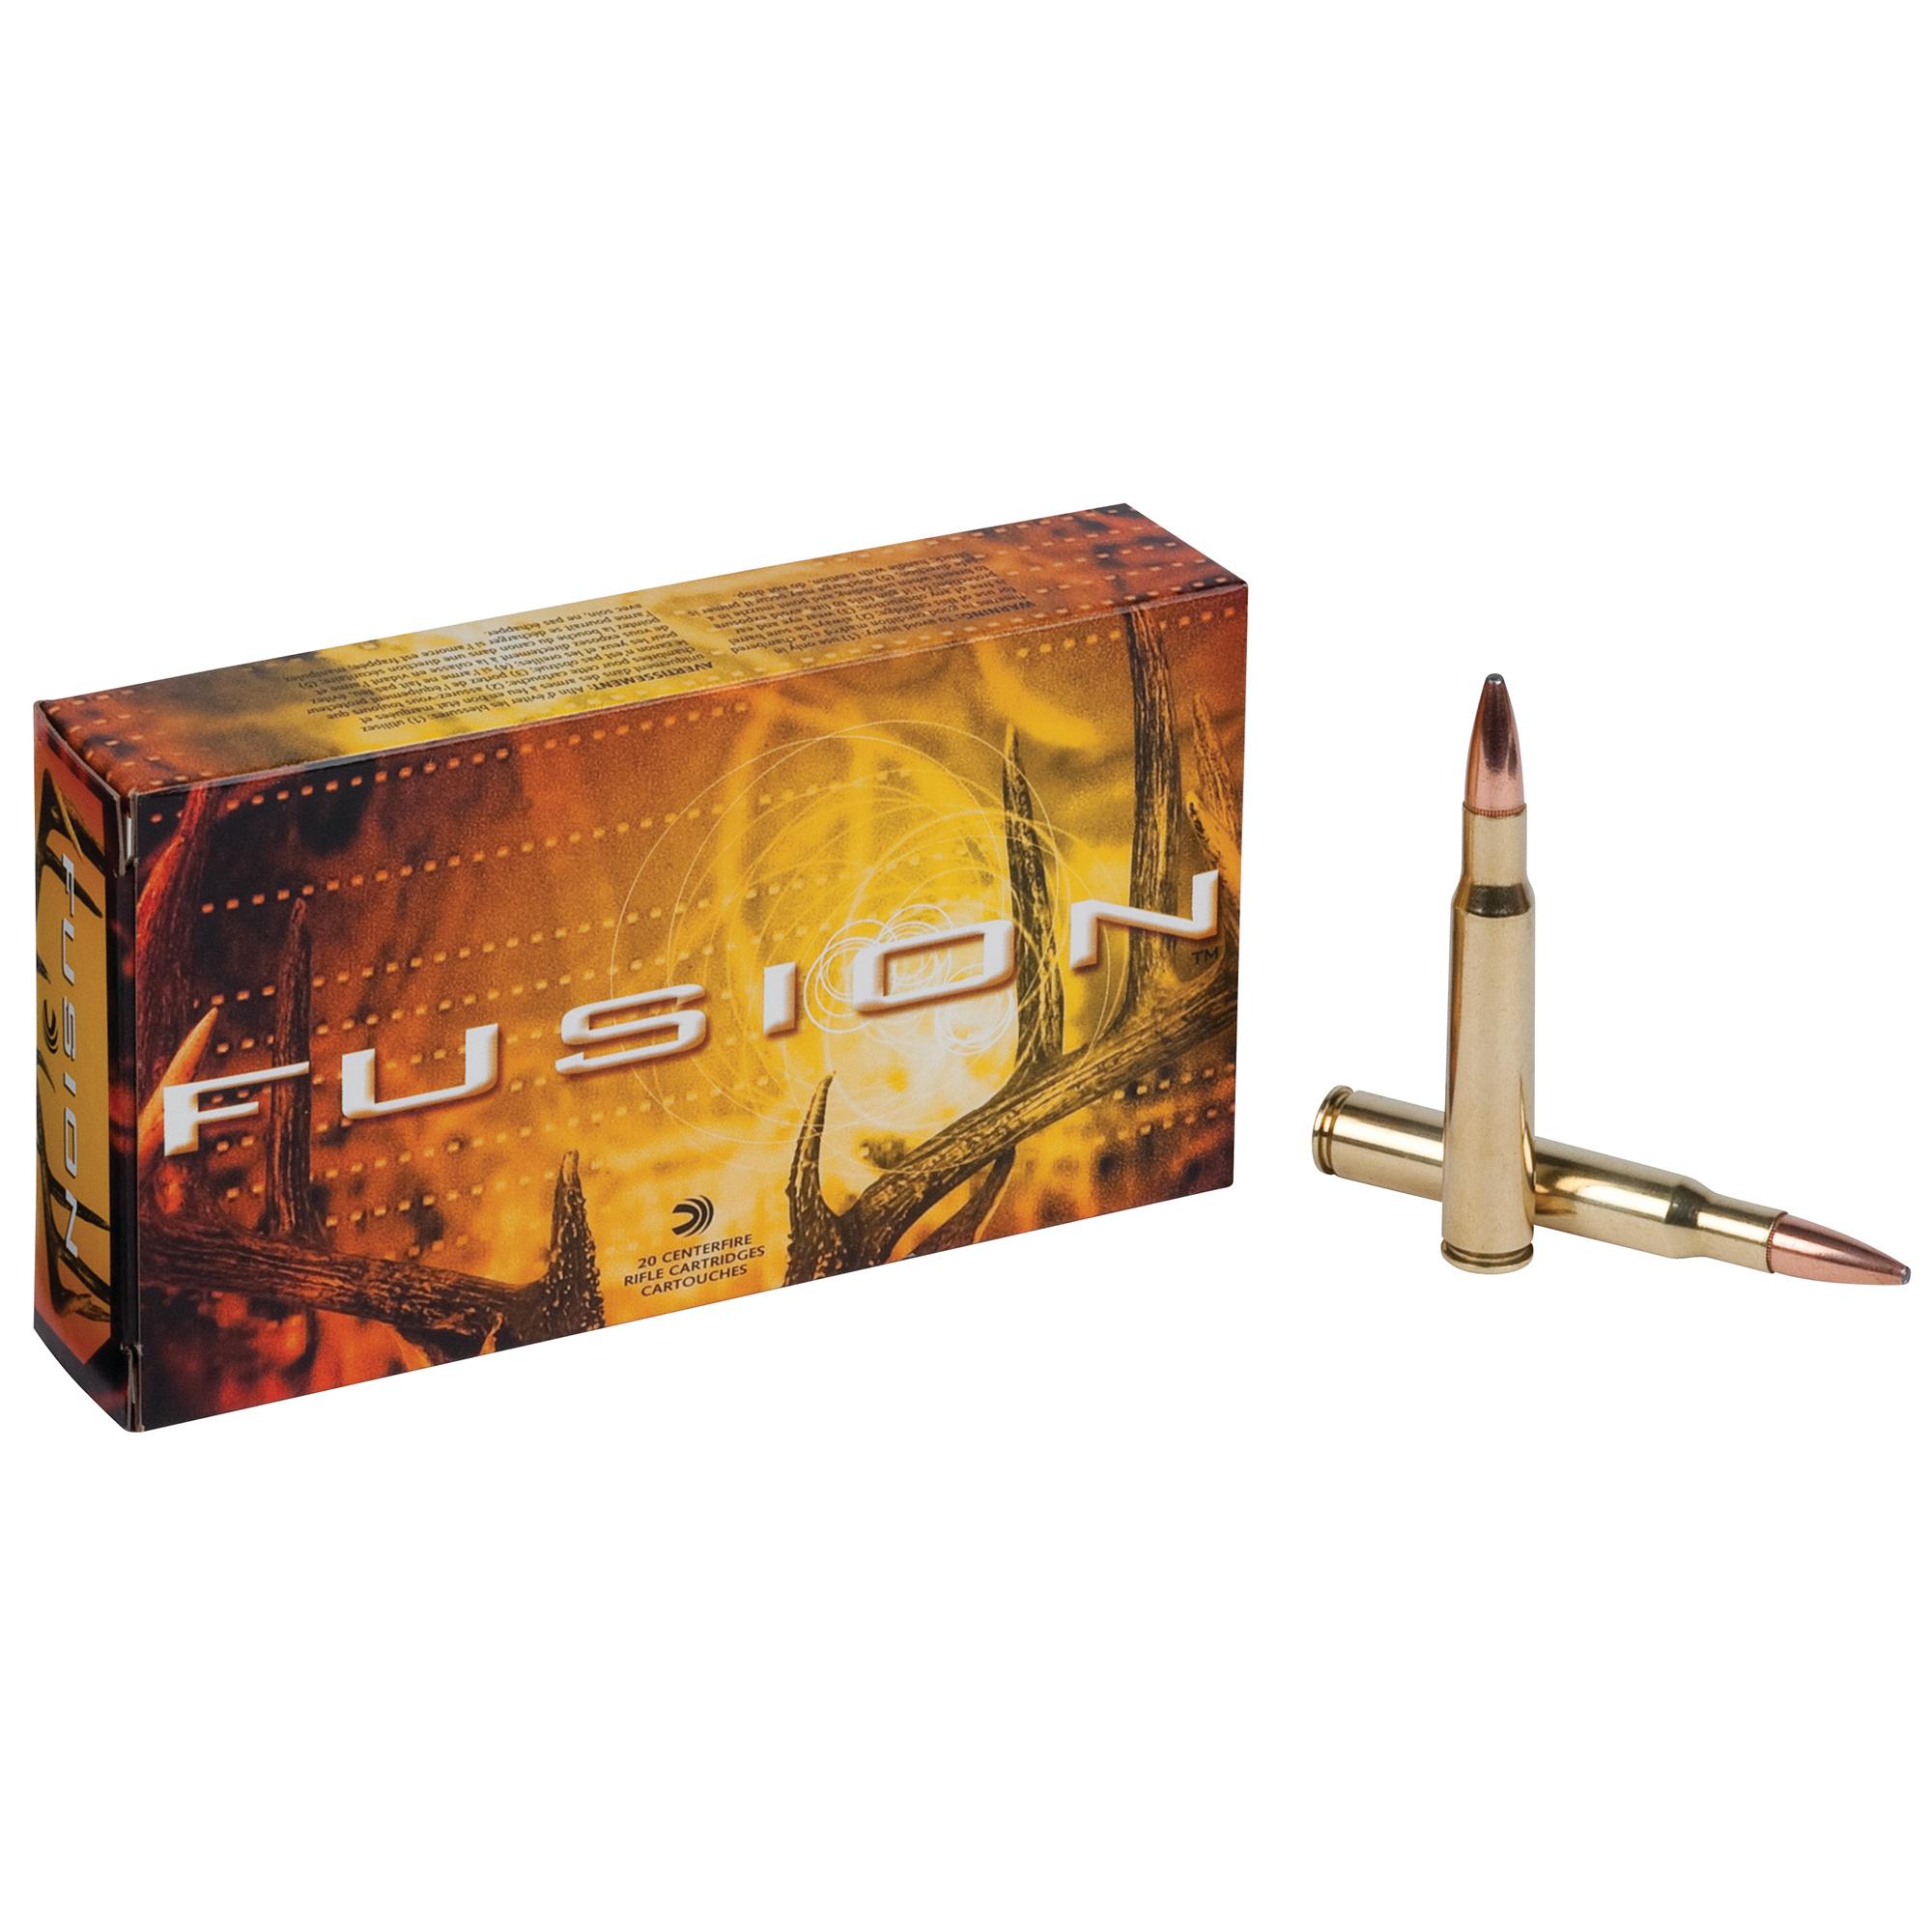 Fusion Rifle Ammunition, 7mm-08 Rem, 140-gr, BTSP